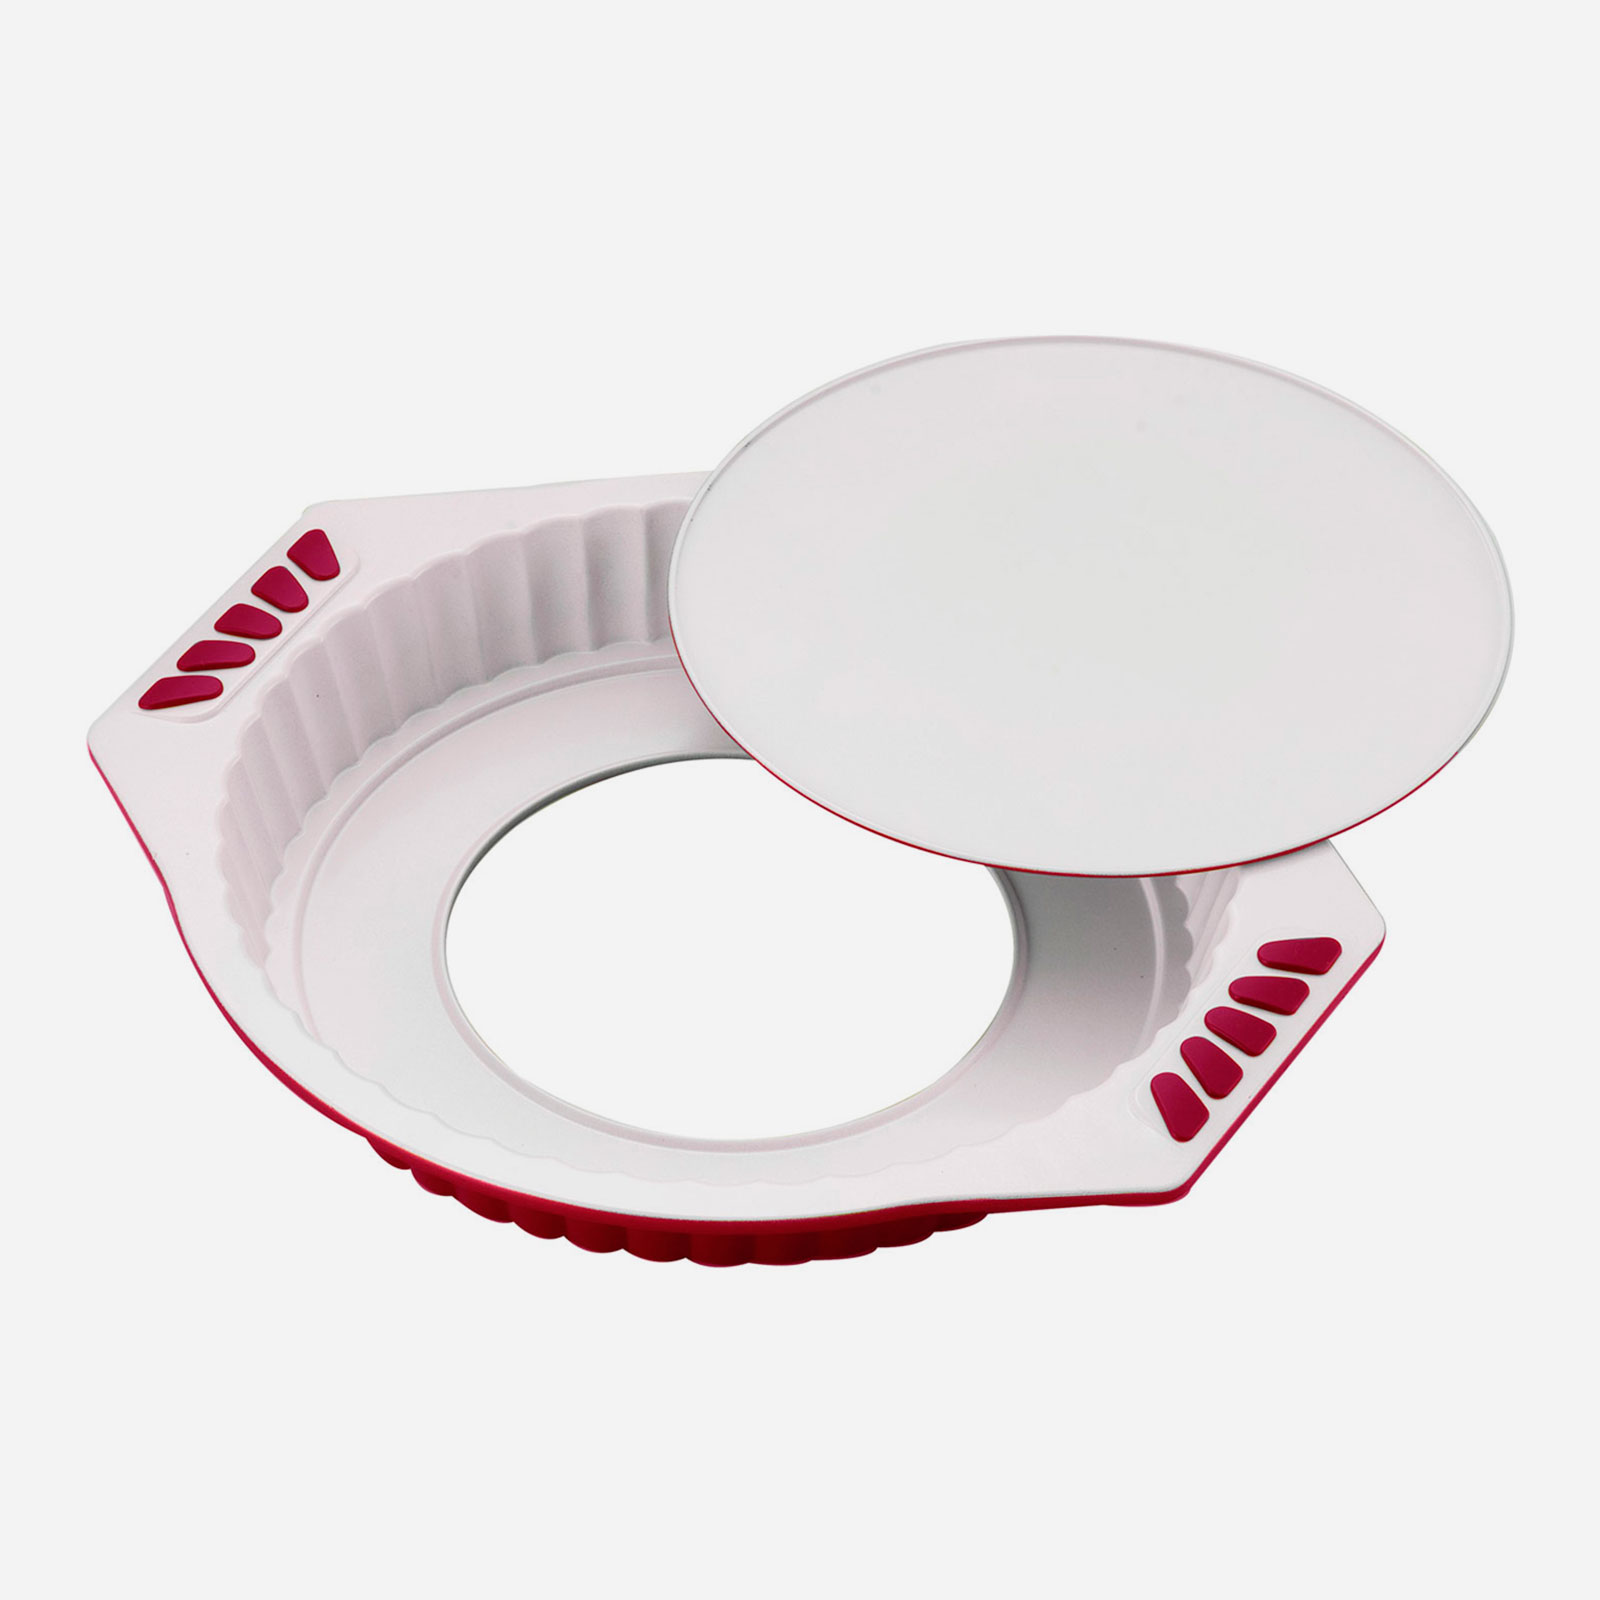 Форма для выпечки круглая глубокая